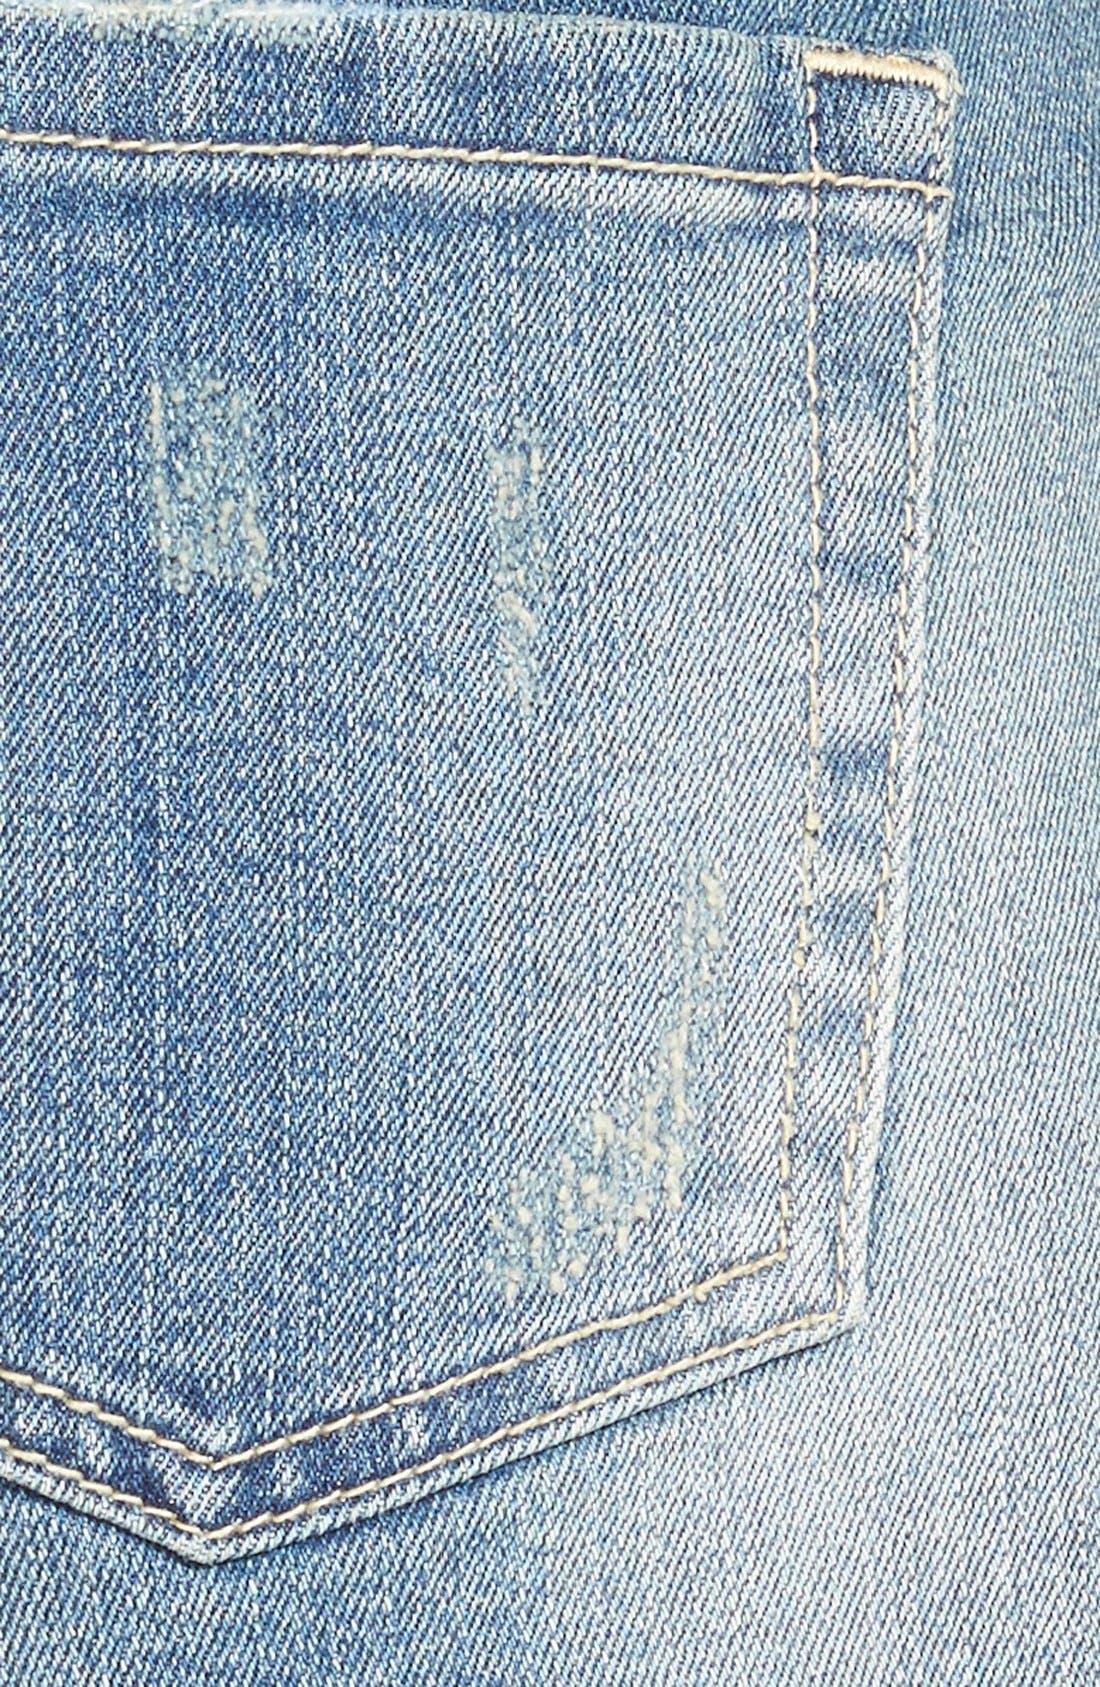 Alternate Image 3  - SP Black Crochet Trim Cutoff Denim Shorts (Medium)